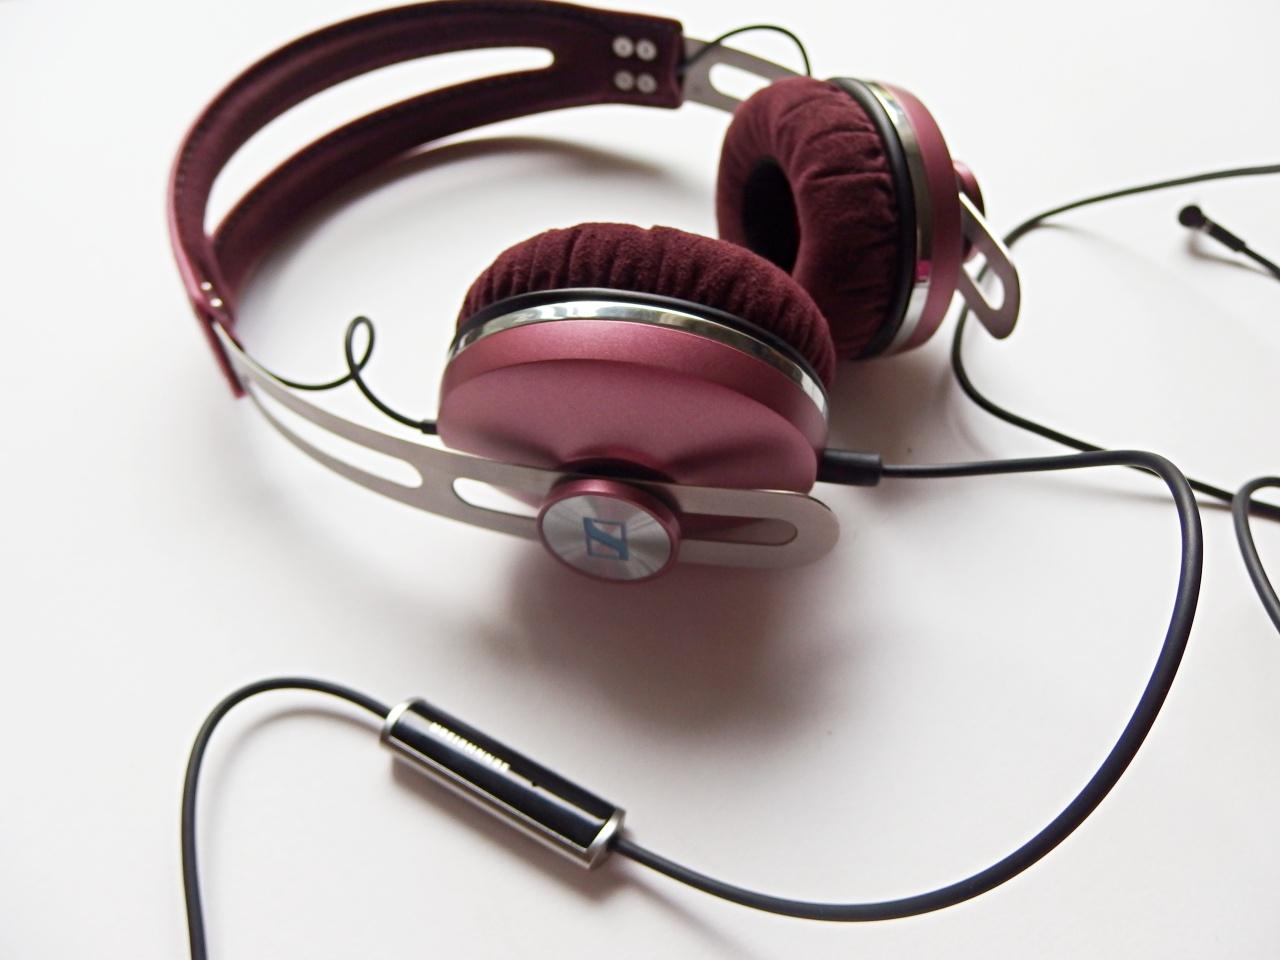 Sennheiser Momentum On-Ear Pink Headphones Review